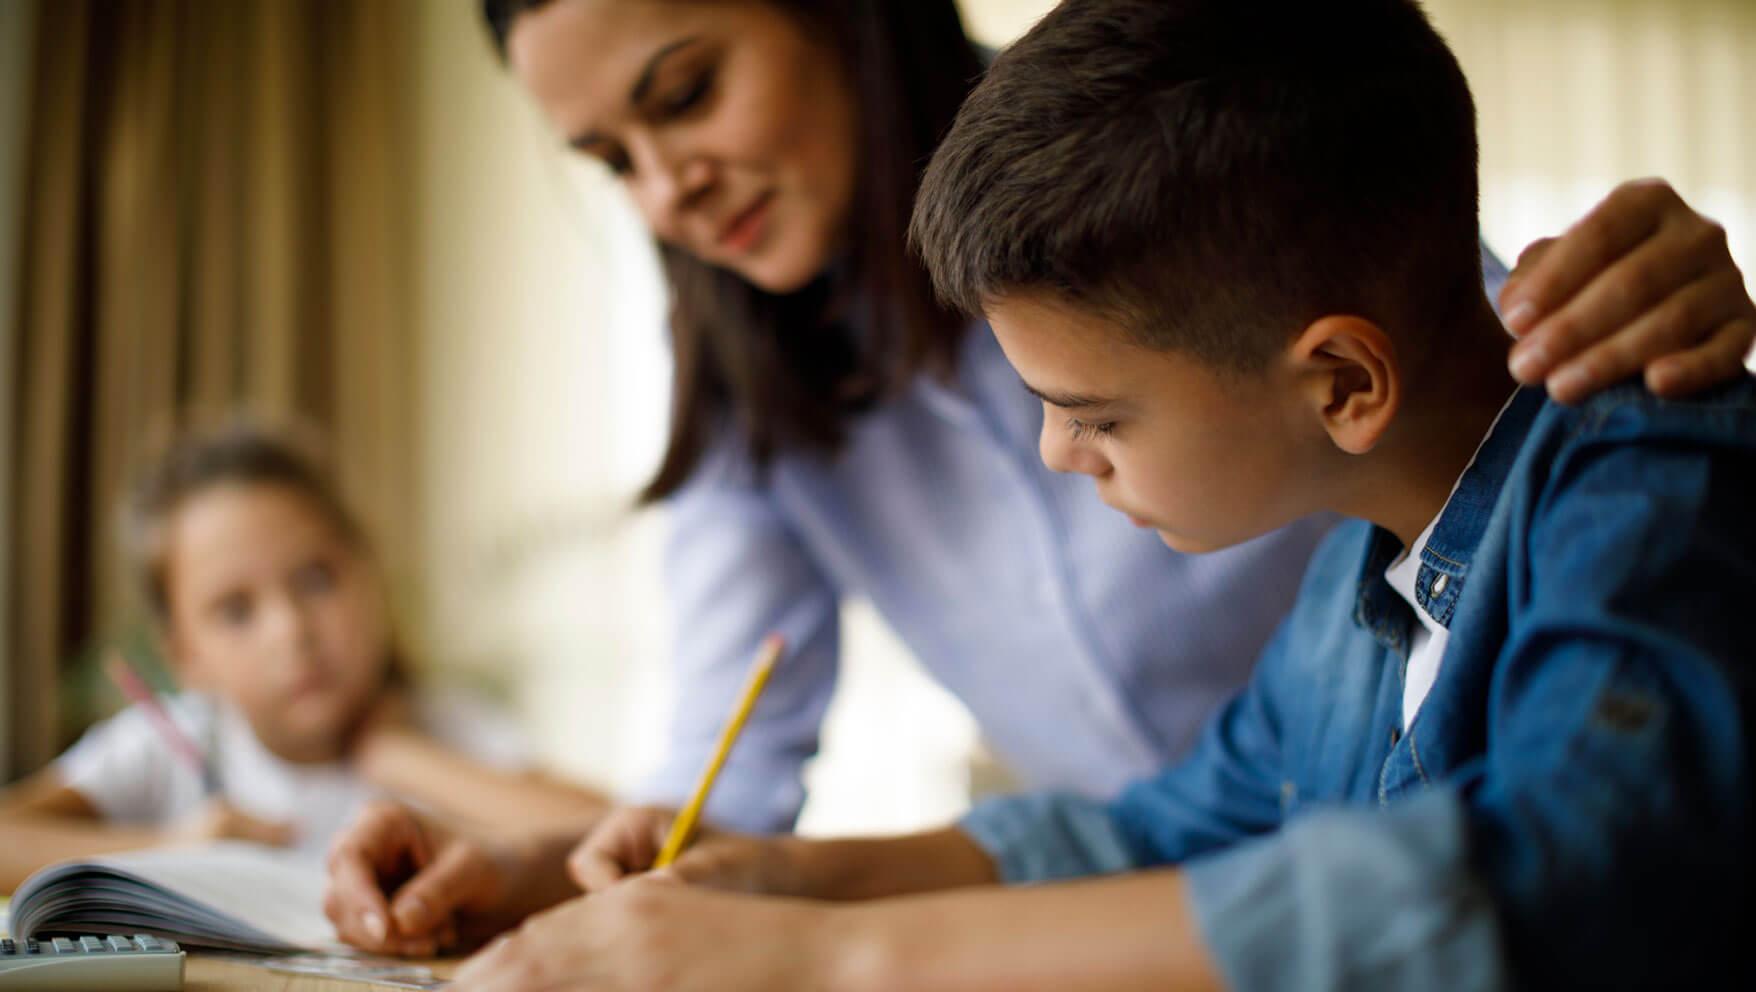 JellyTelly-Christian-homeschooling-ch...